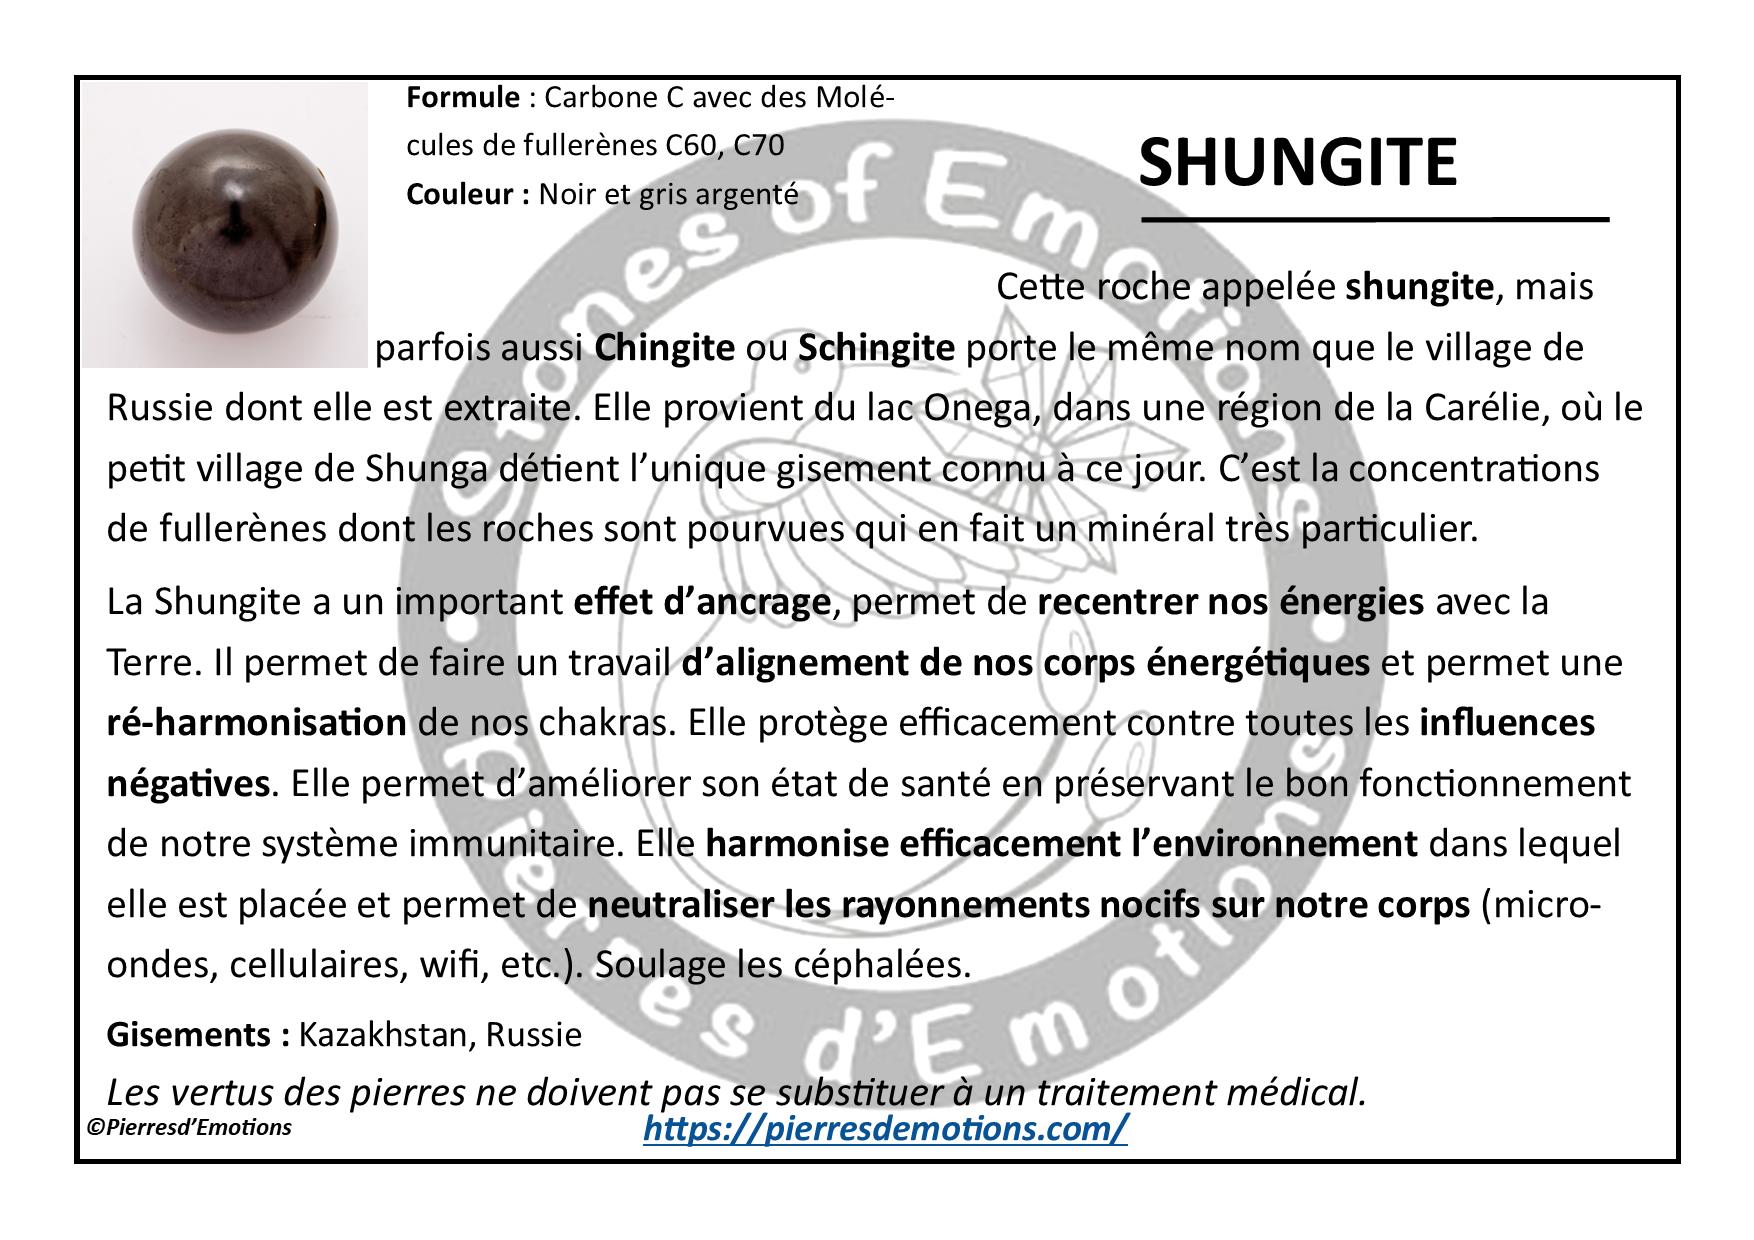 Shungite